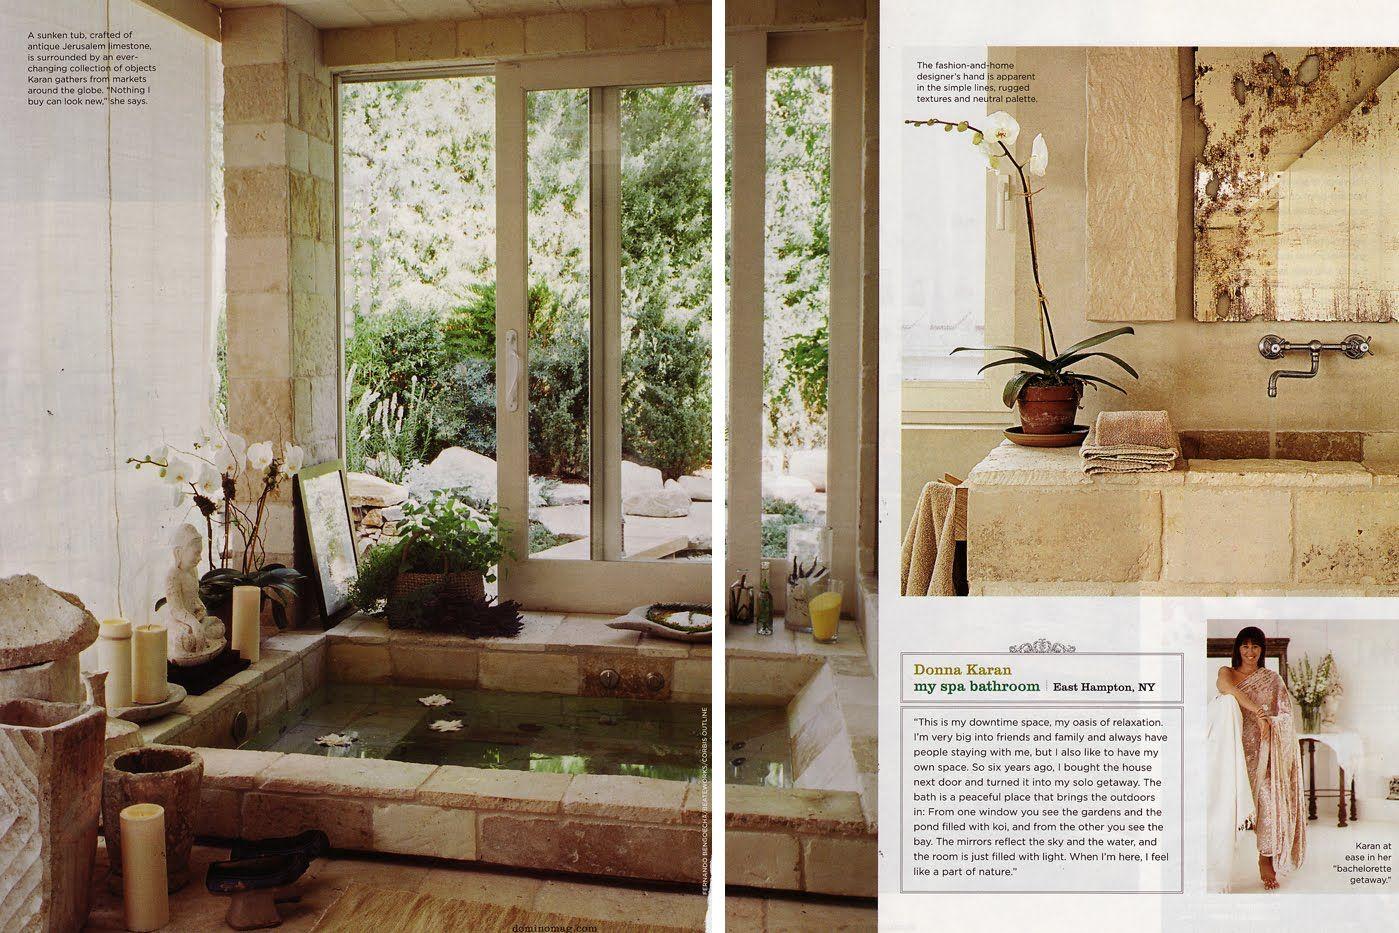 antique look spa bath all home interior ideasdonna karan\\u0027s amazing spa bathroom with sunken bath bathedonna karan\\u0027s amazing spa